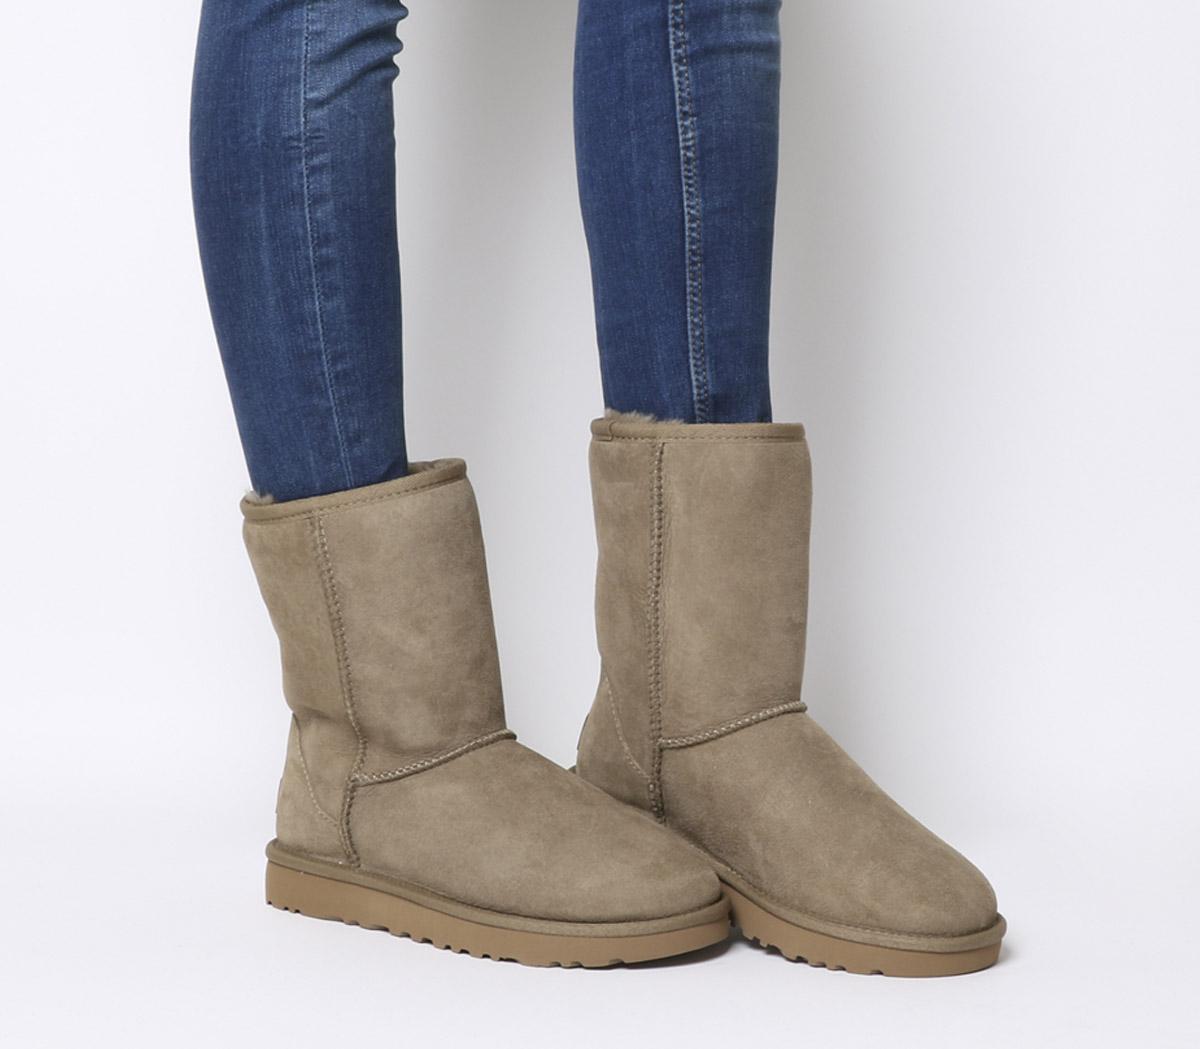 Women's UGG Classic Short II Sheepskin Boots in Antilope